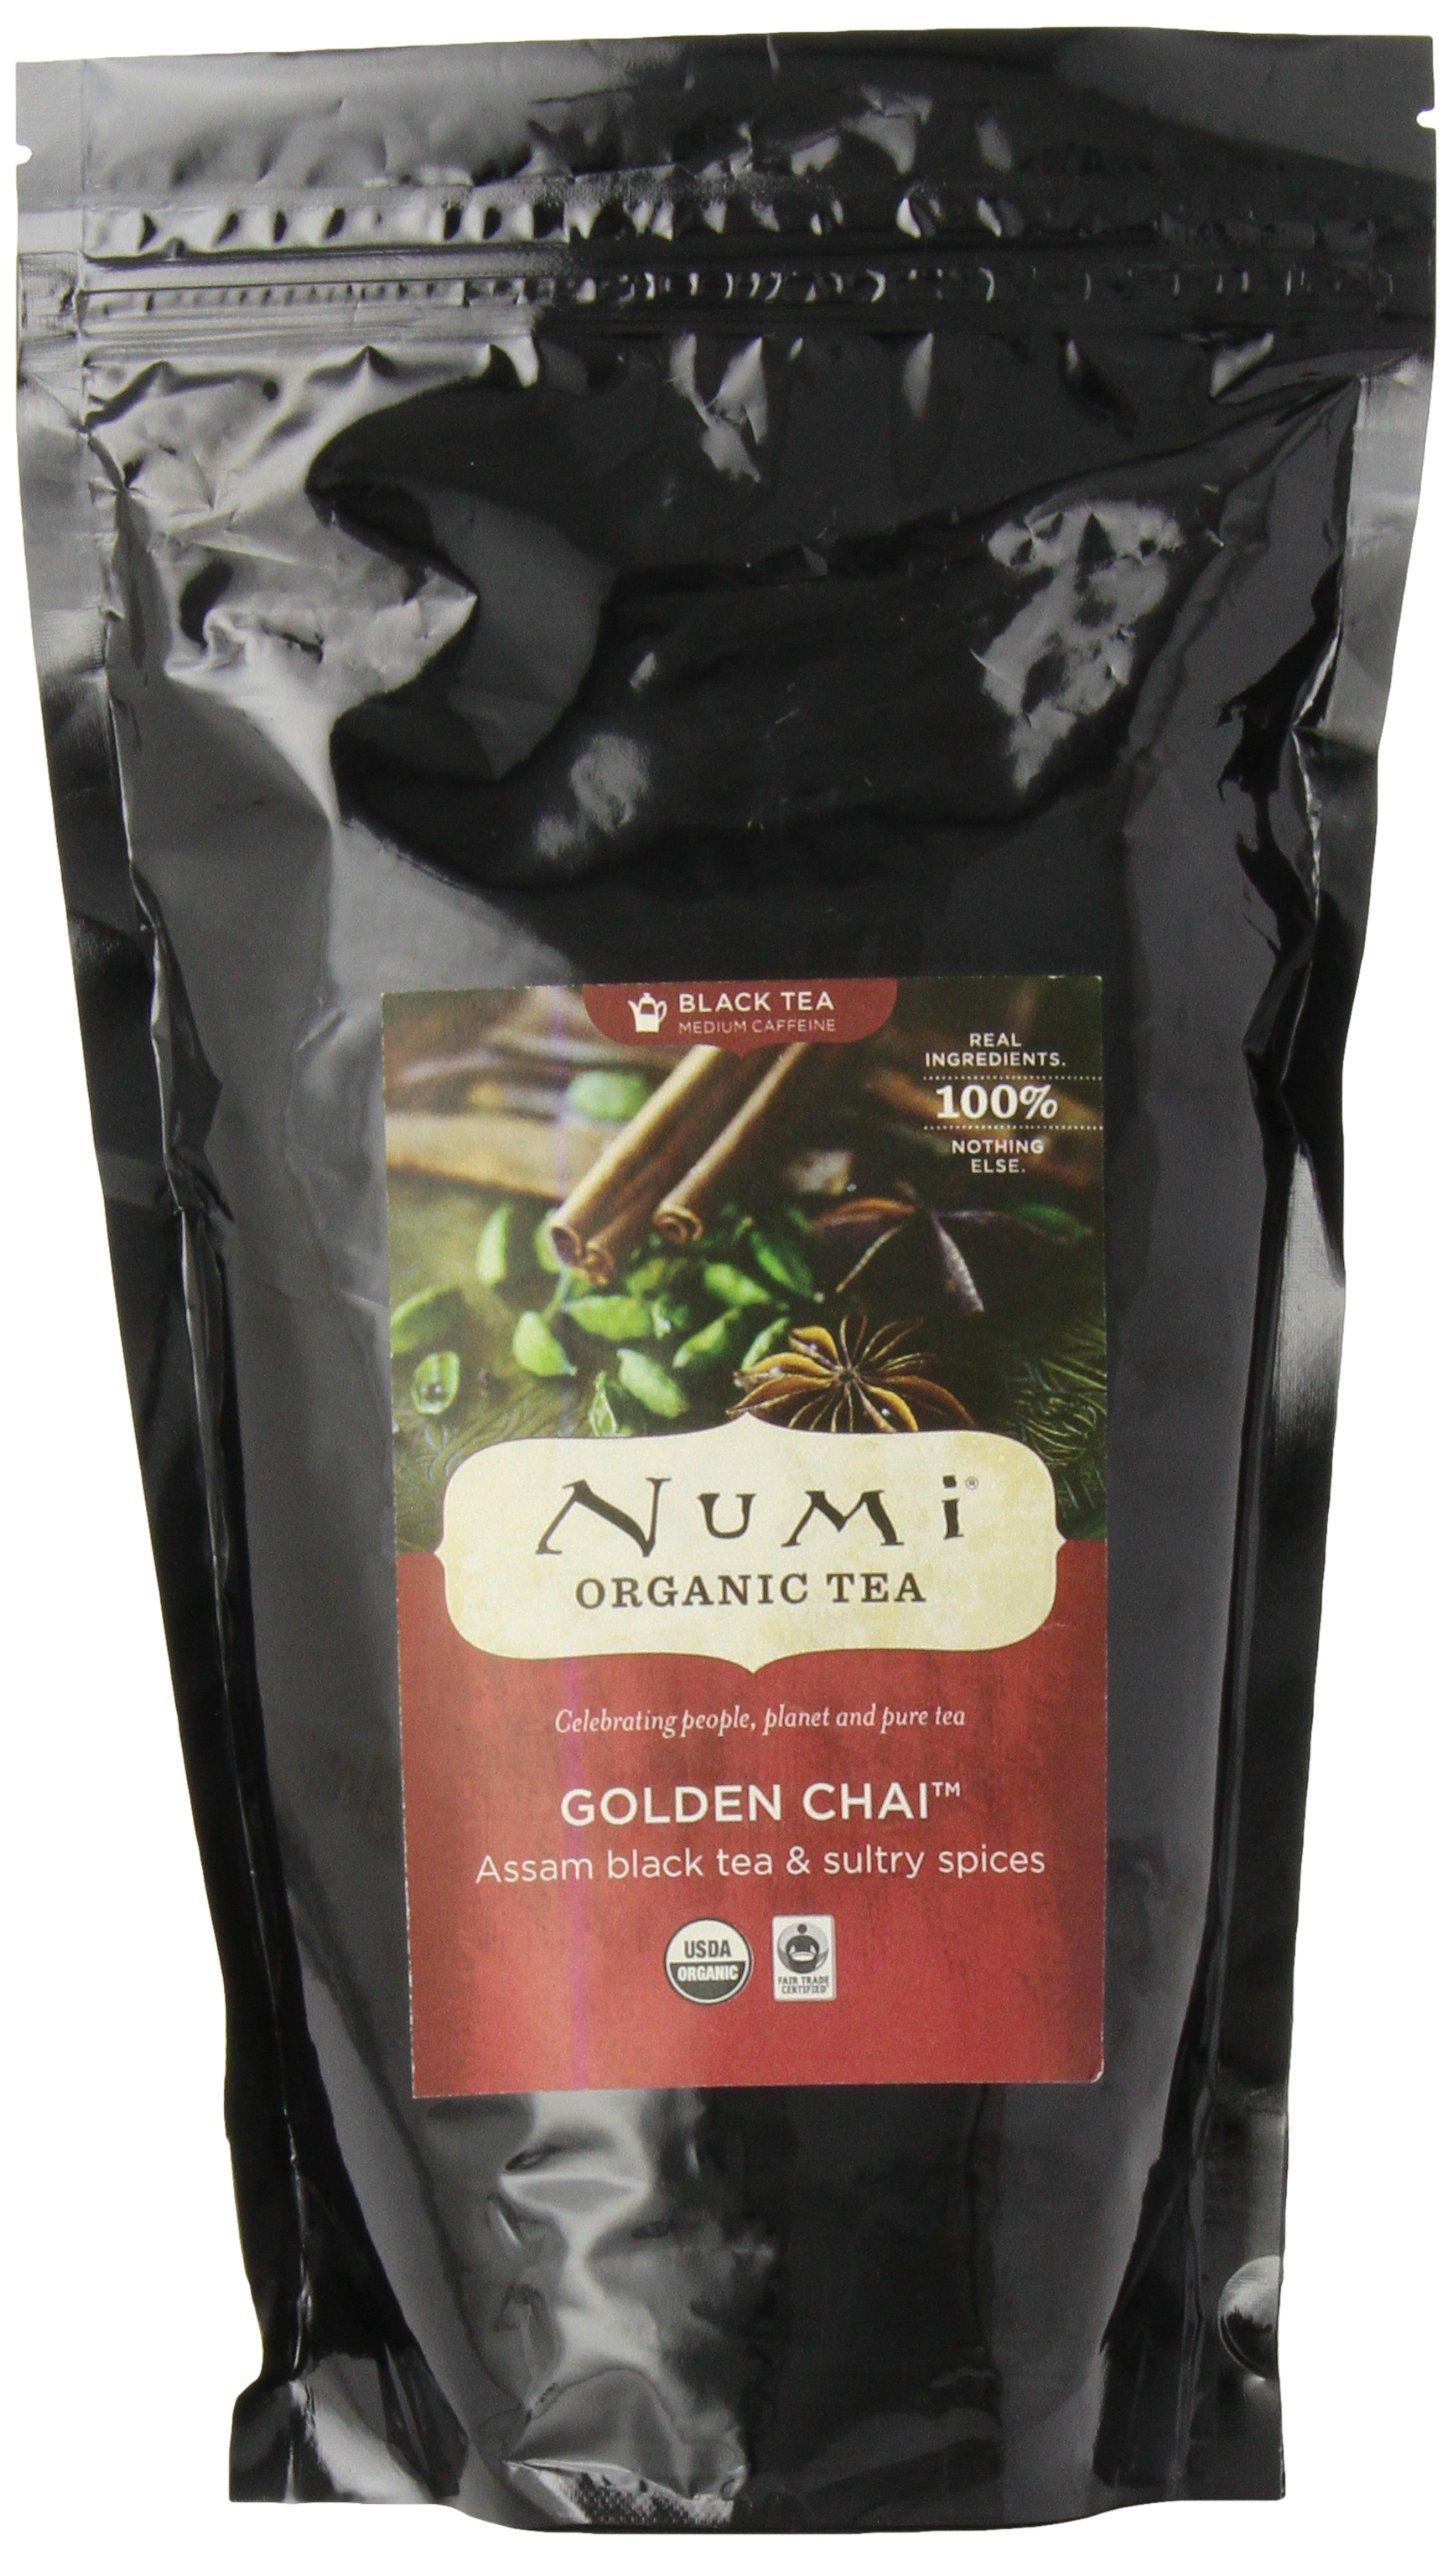 Numi Organic Tea Golden Chai, 16 Ounce Pouch (Pack of 6), Loose Leaf Black Tea by Numi Organic Tea (Image #1)